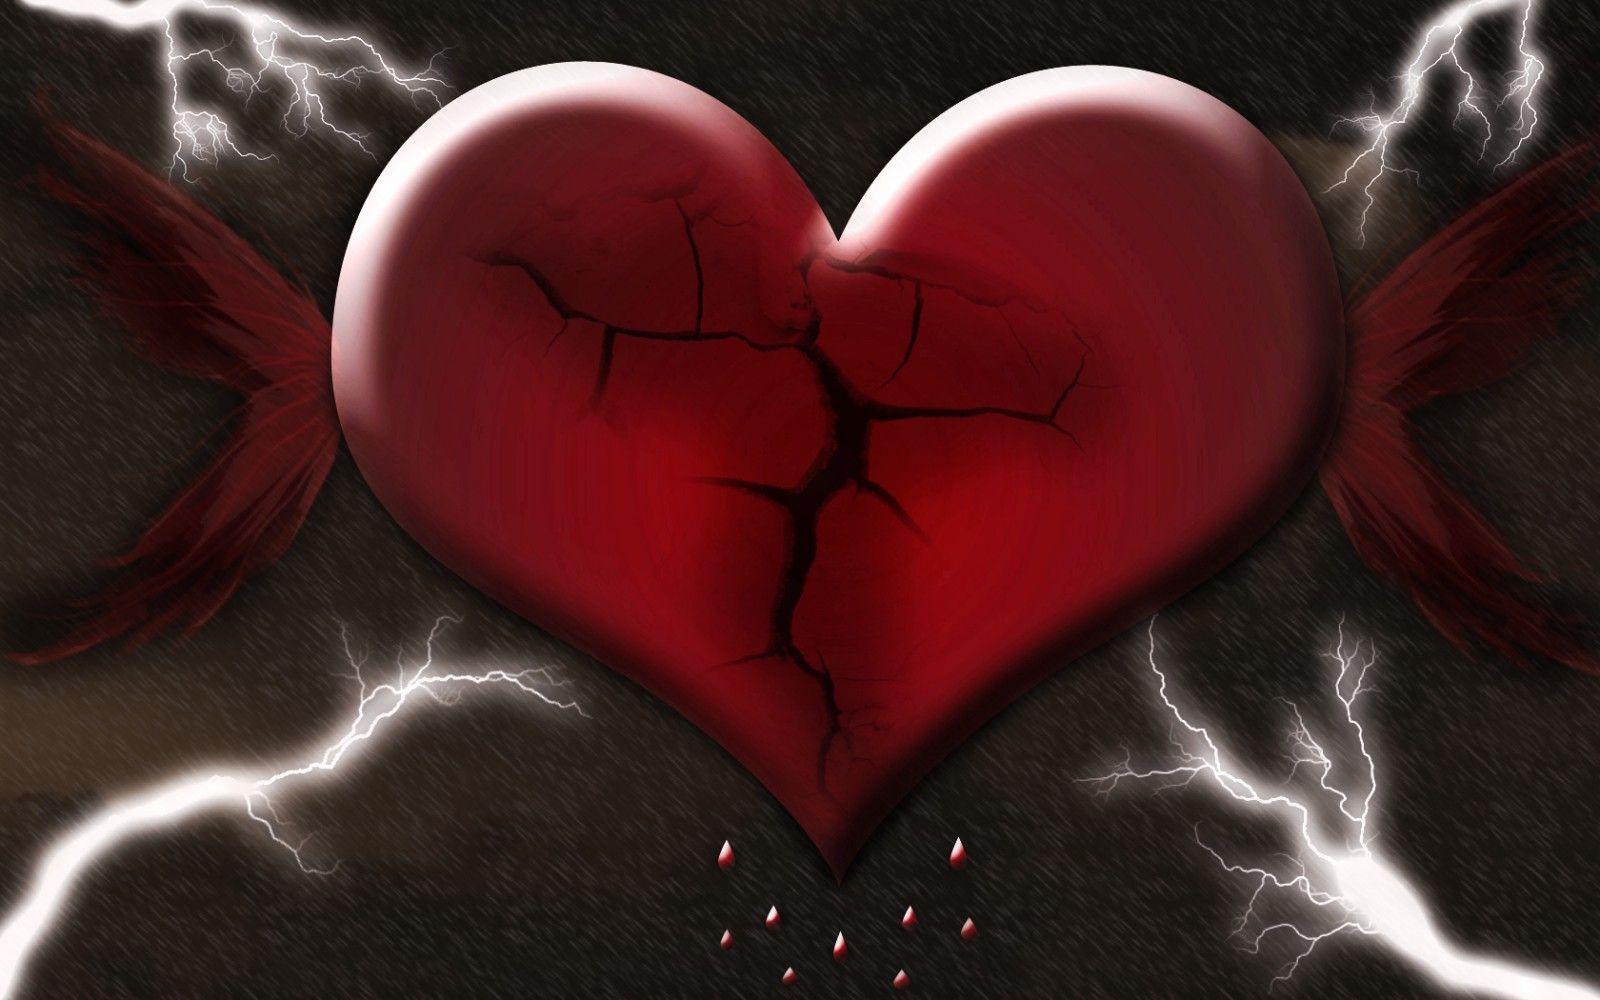 Broken Heart Hd Wallpaper Free Download 4359